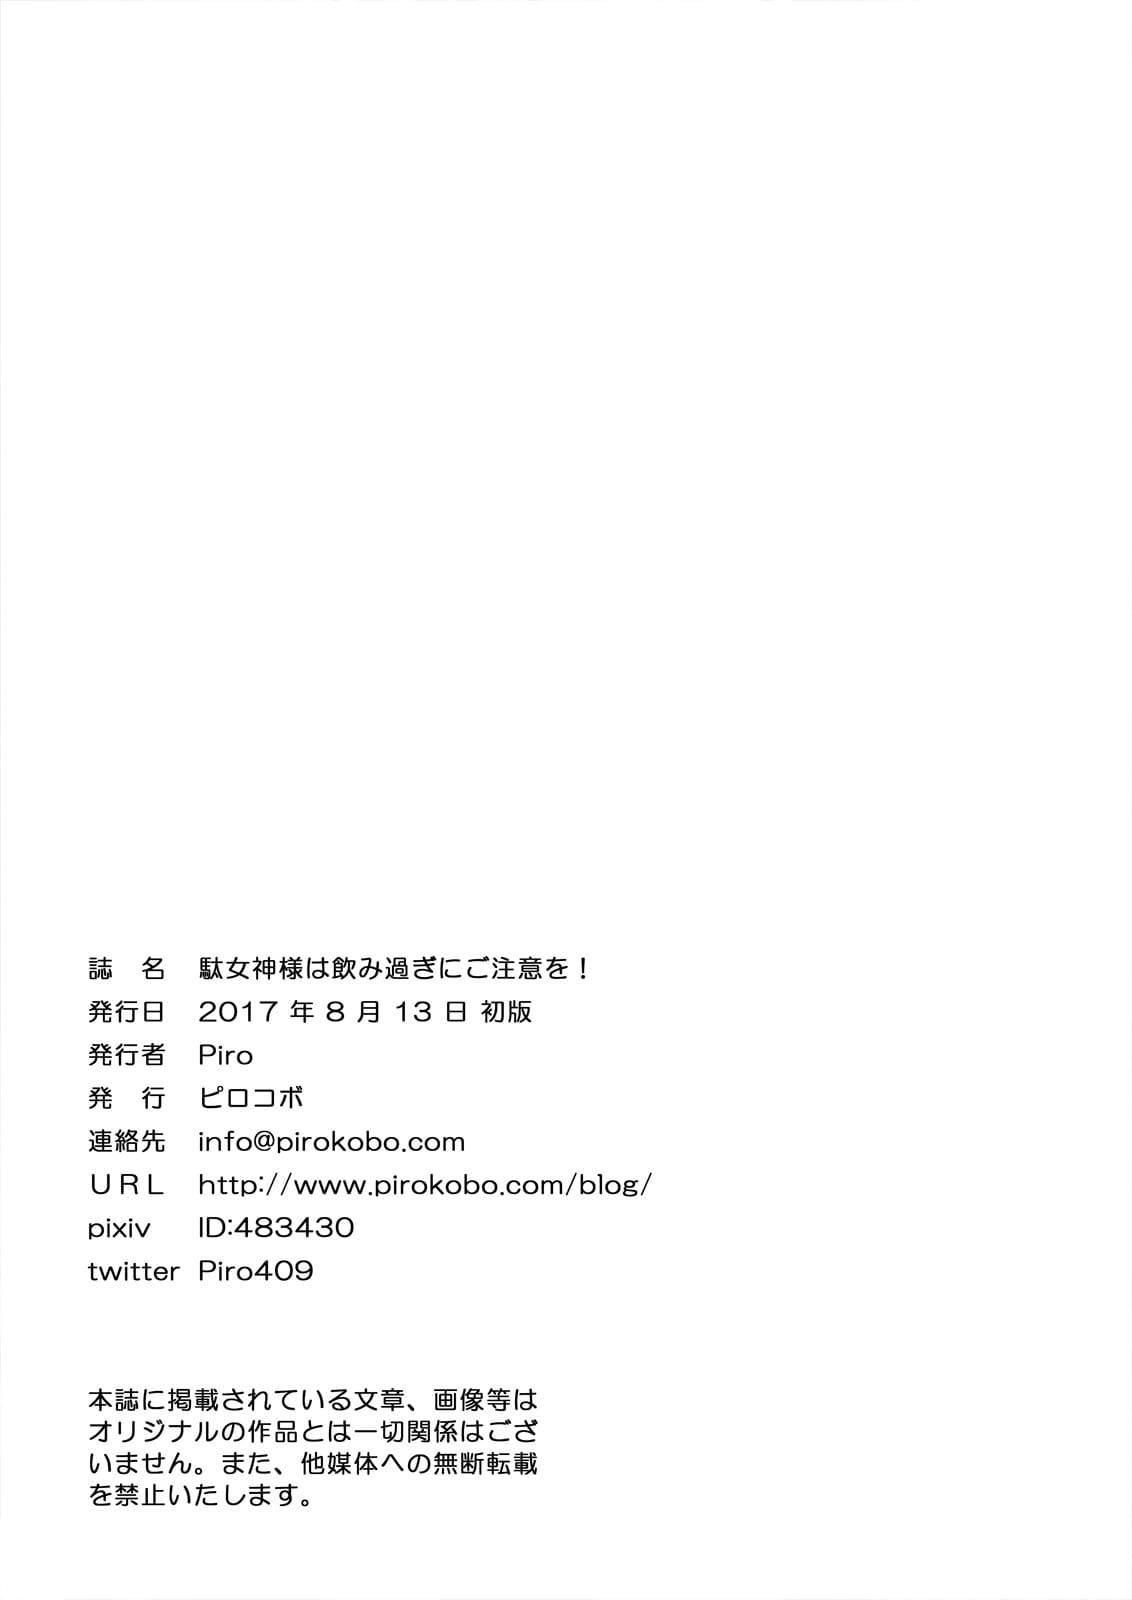 HentaiVN.net - Ảnh 27 - Damegami-sama wa Nomisugi ni Gochuui o! (Kono Subarashii Sekai ni Syukufuku o!) - 駄女神様は飲み過ぎにご注意を! (この素晴らしい世界に祝福を!) - Oneshot